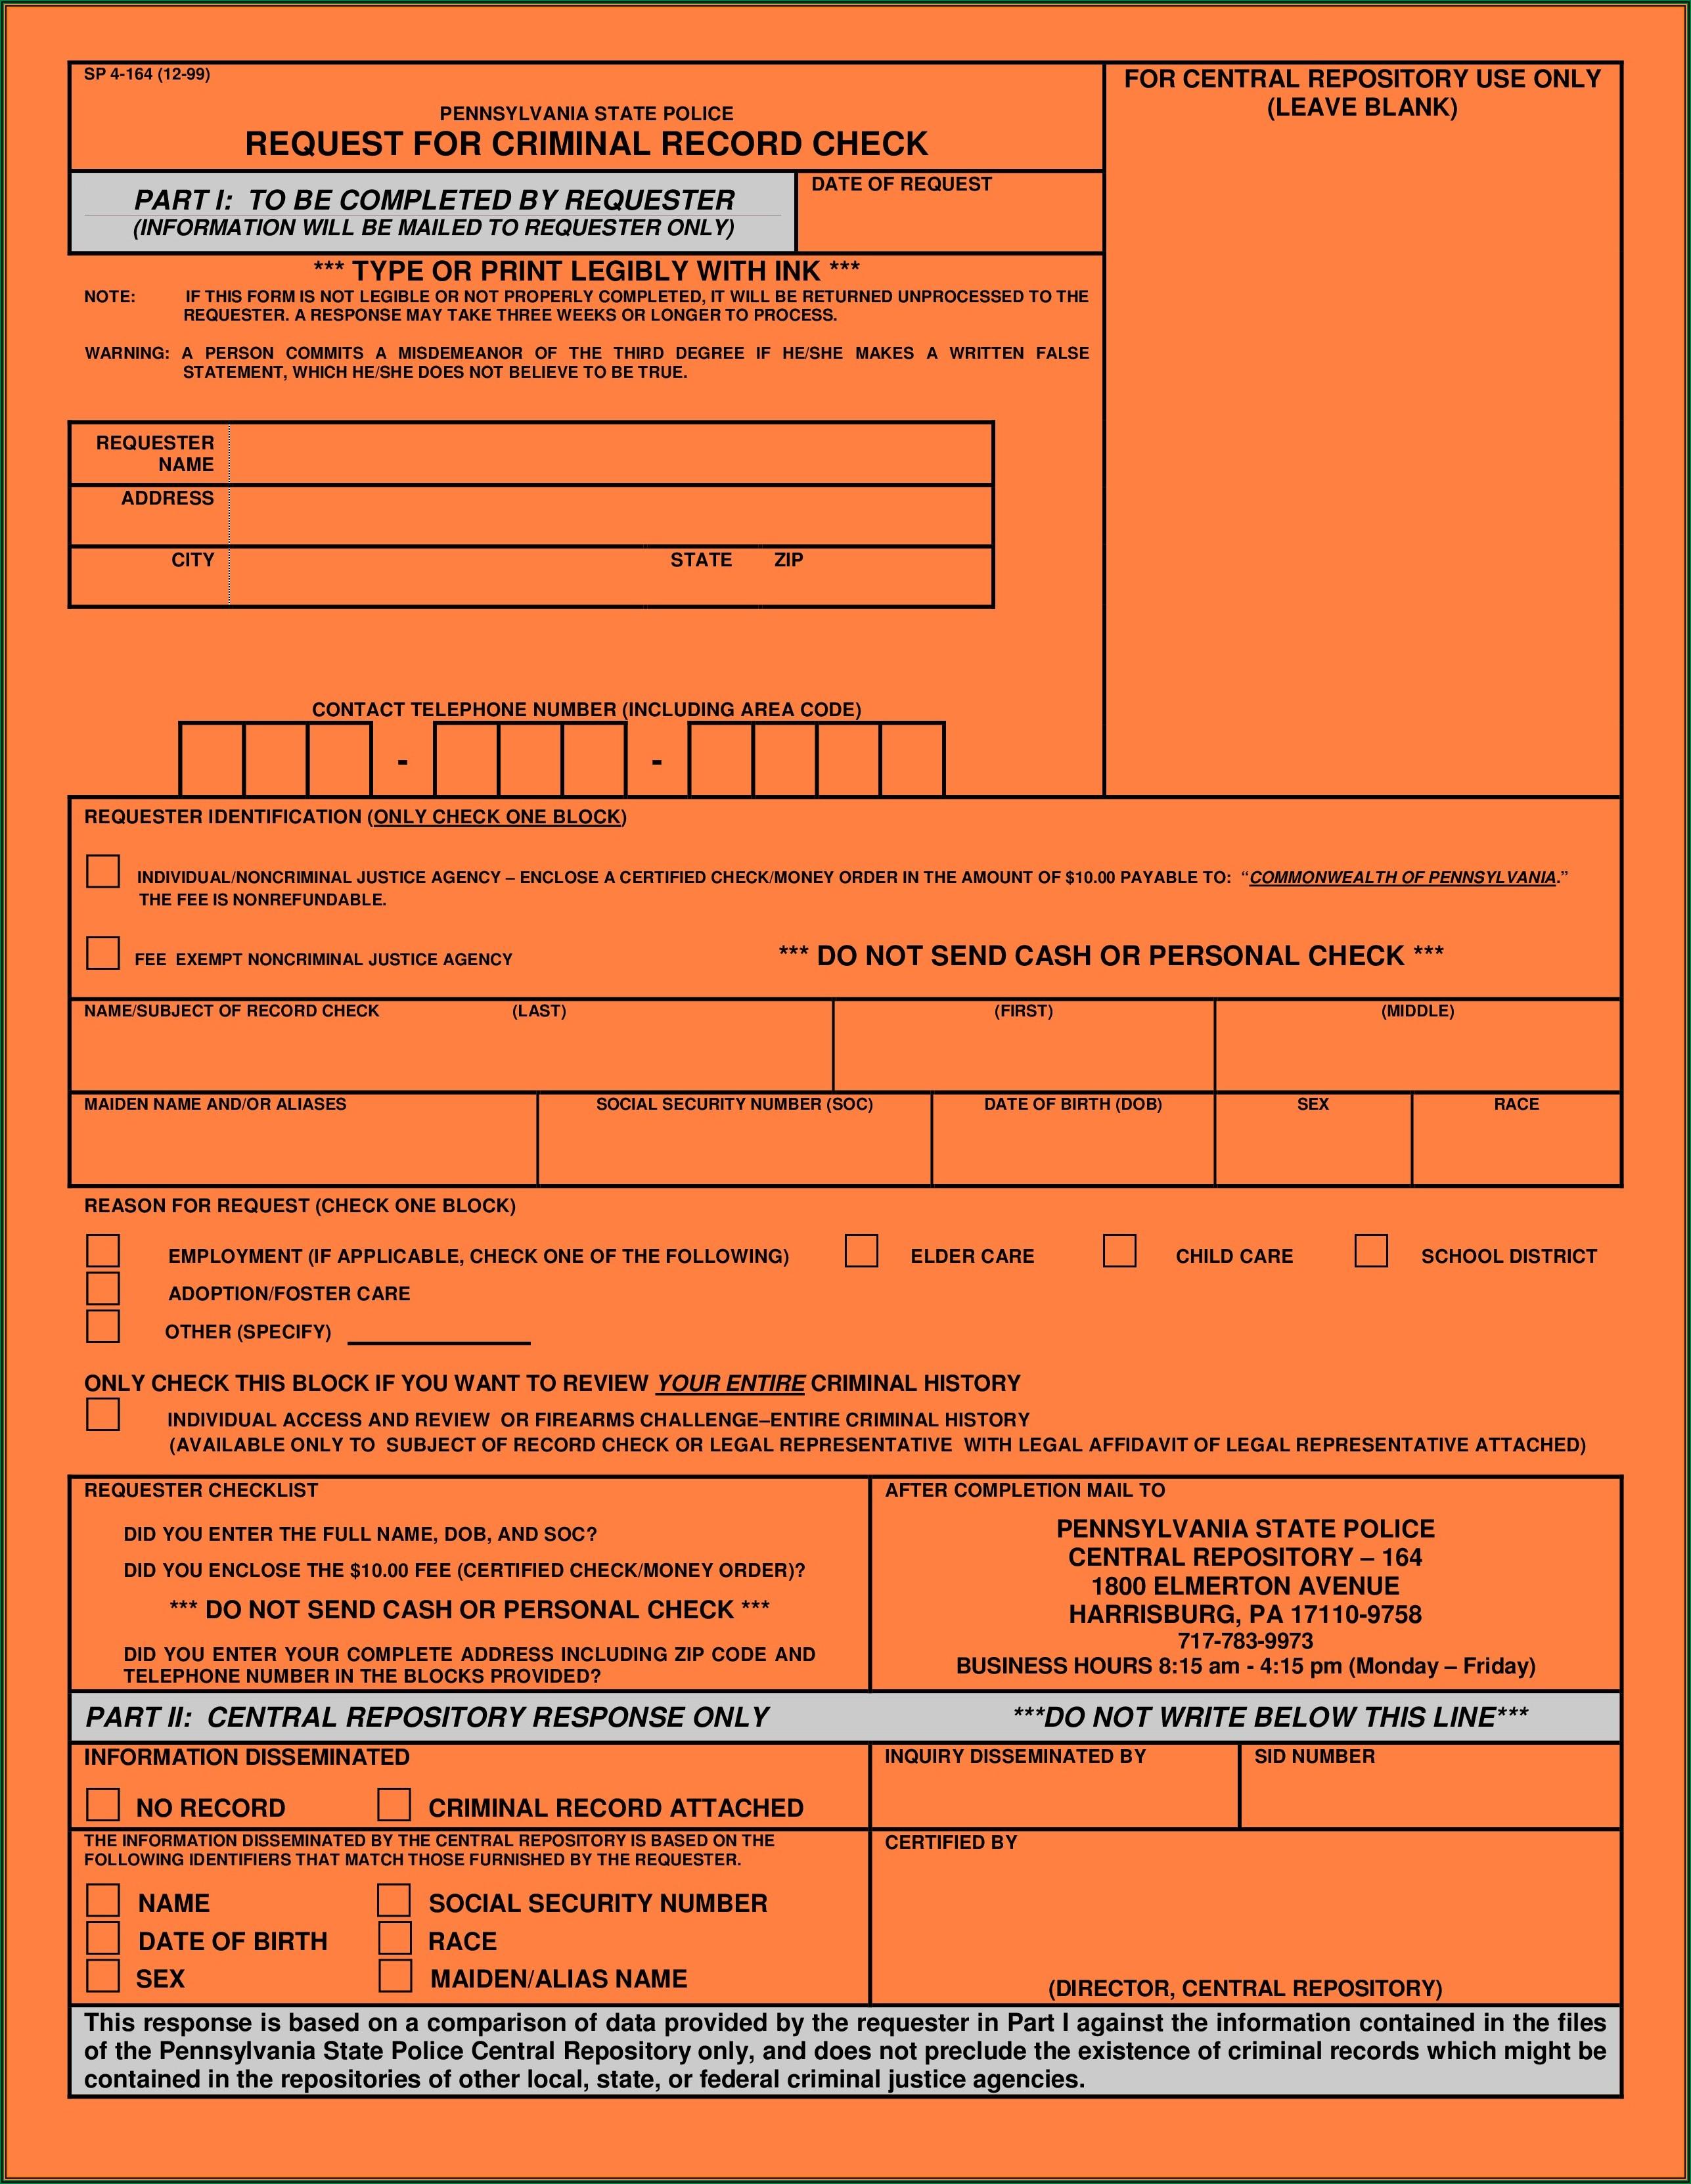 Missouri State Highway Patrol Criminal Background Check Form